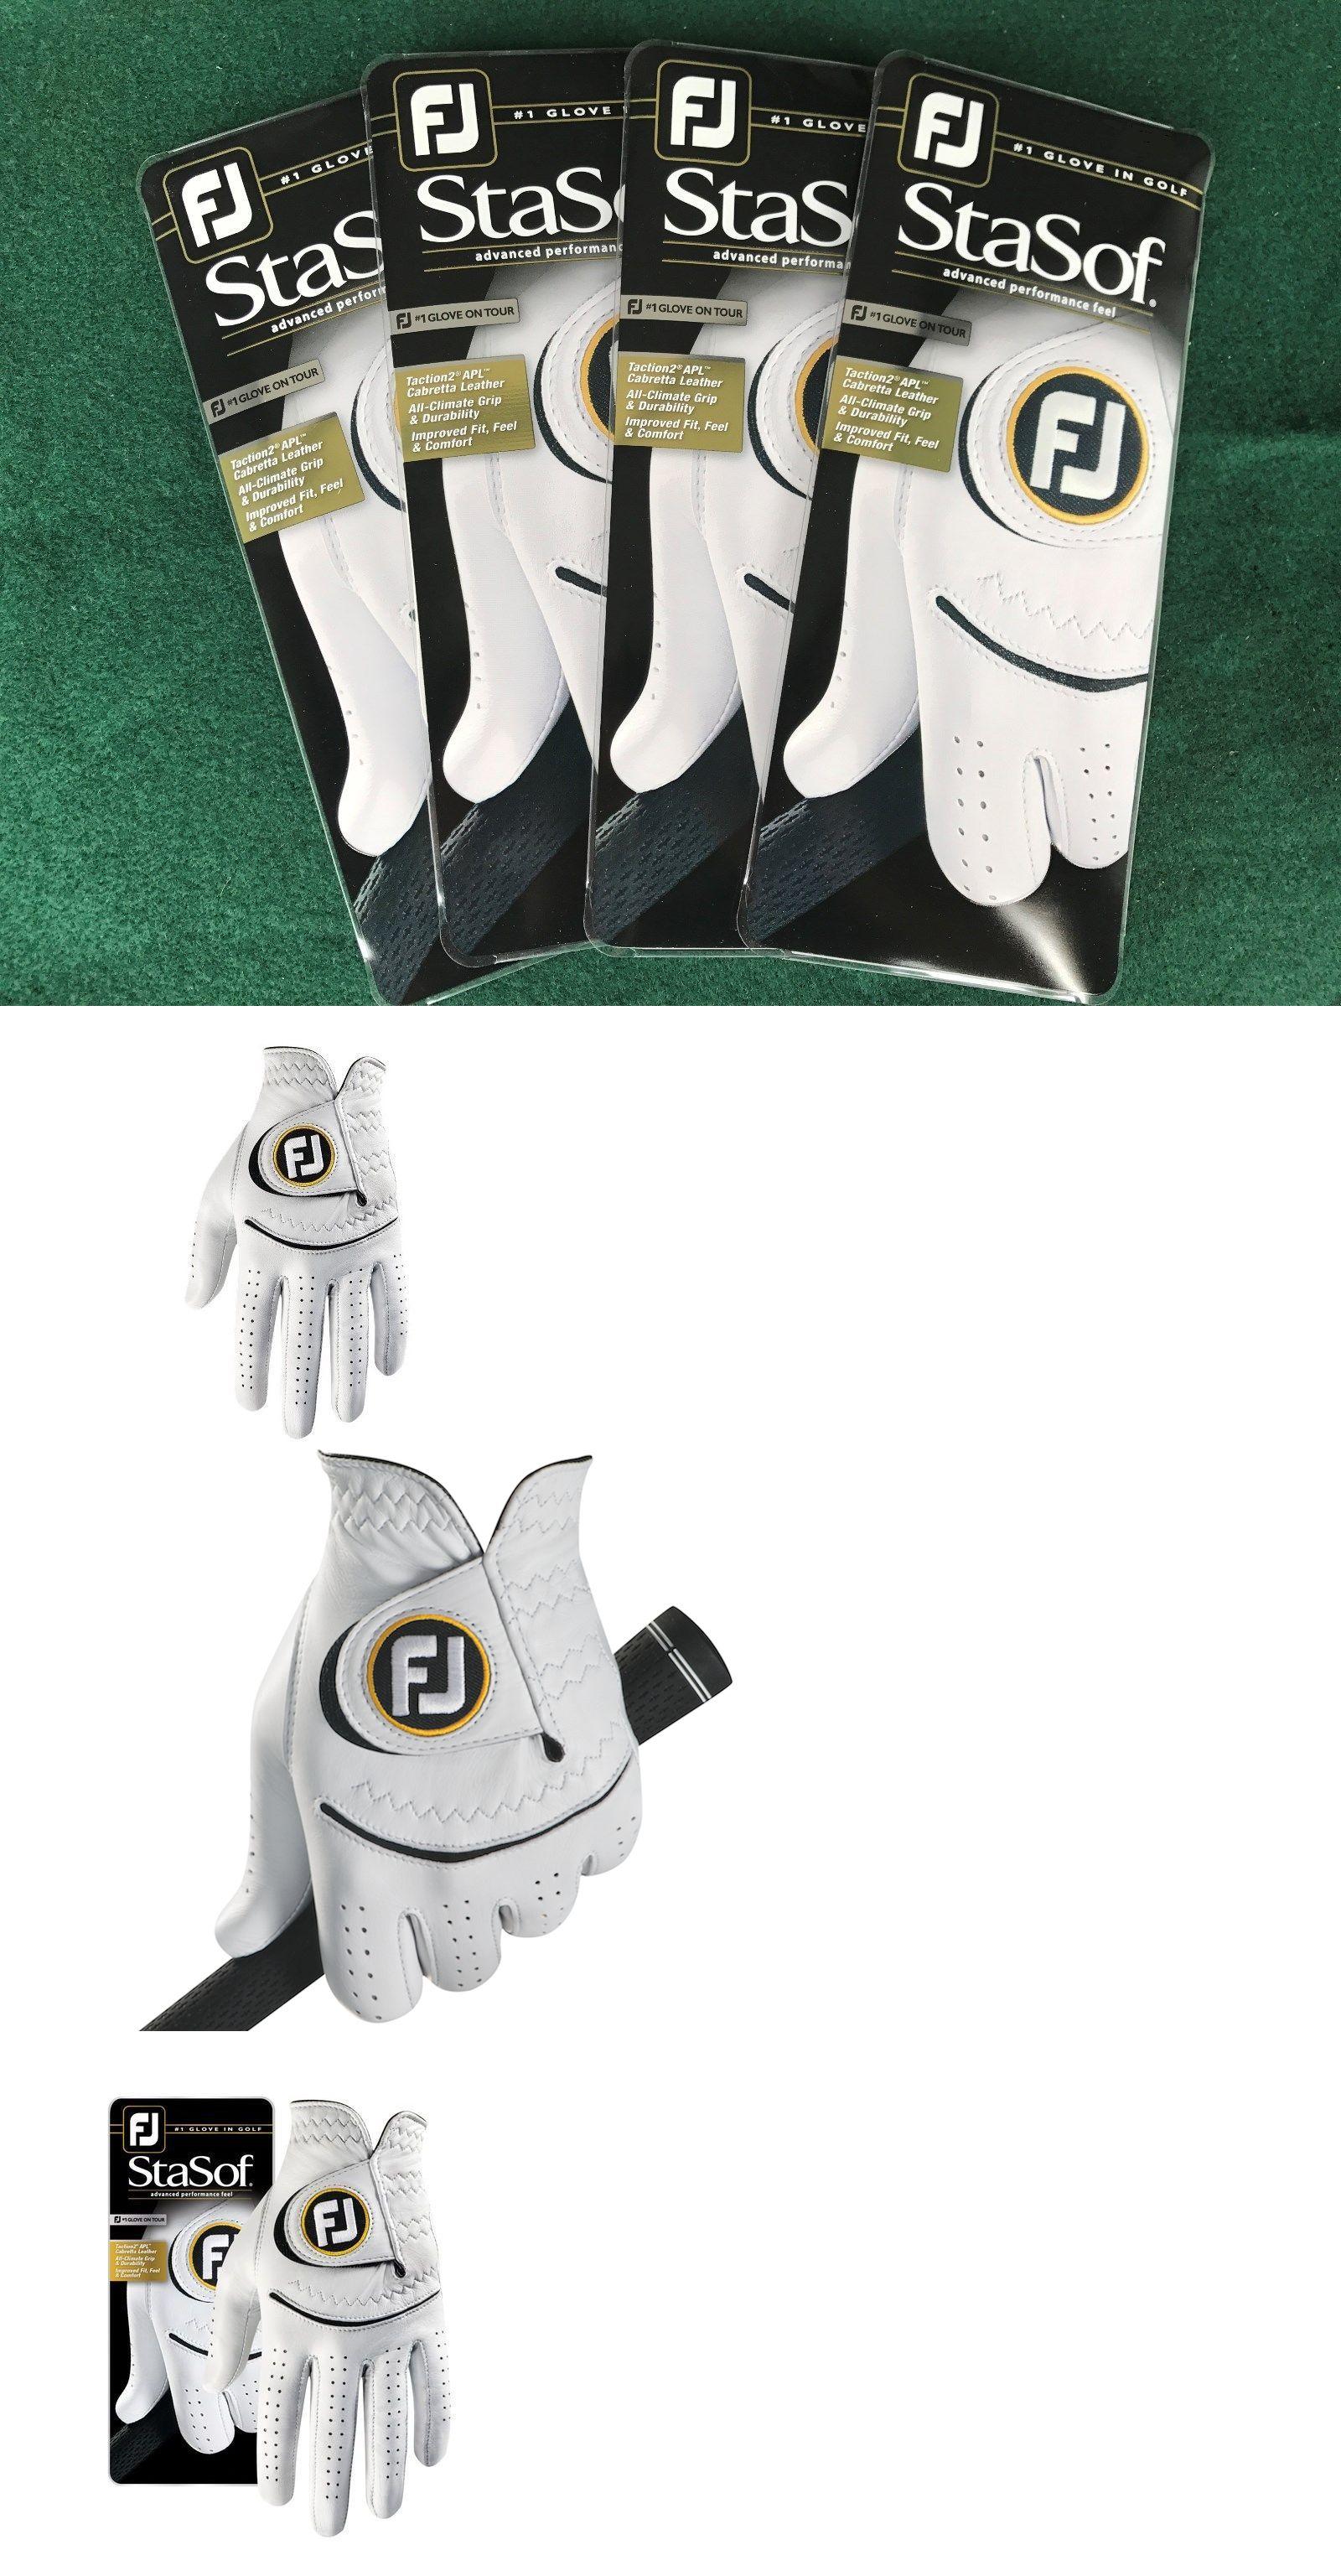 Mens gloves cadet - Golf Gloves 181135 4 New Footjoy Stasof Golf Gloves Mens Cadet Large W Black